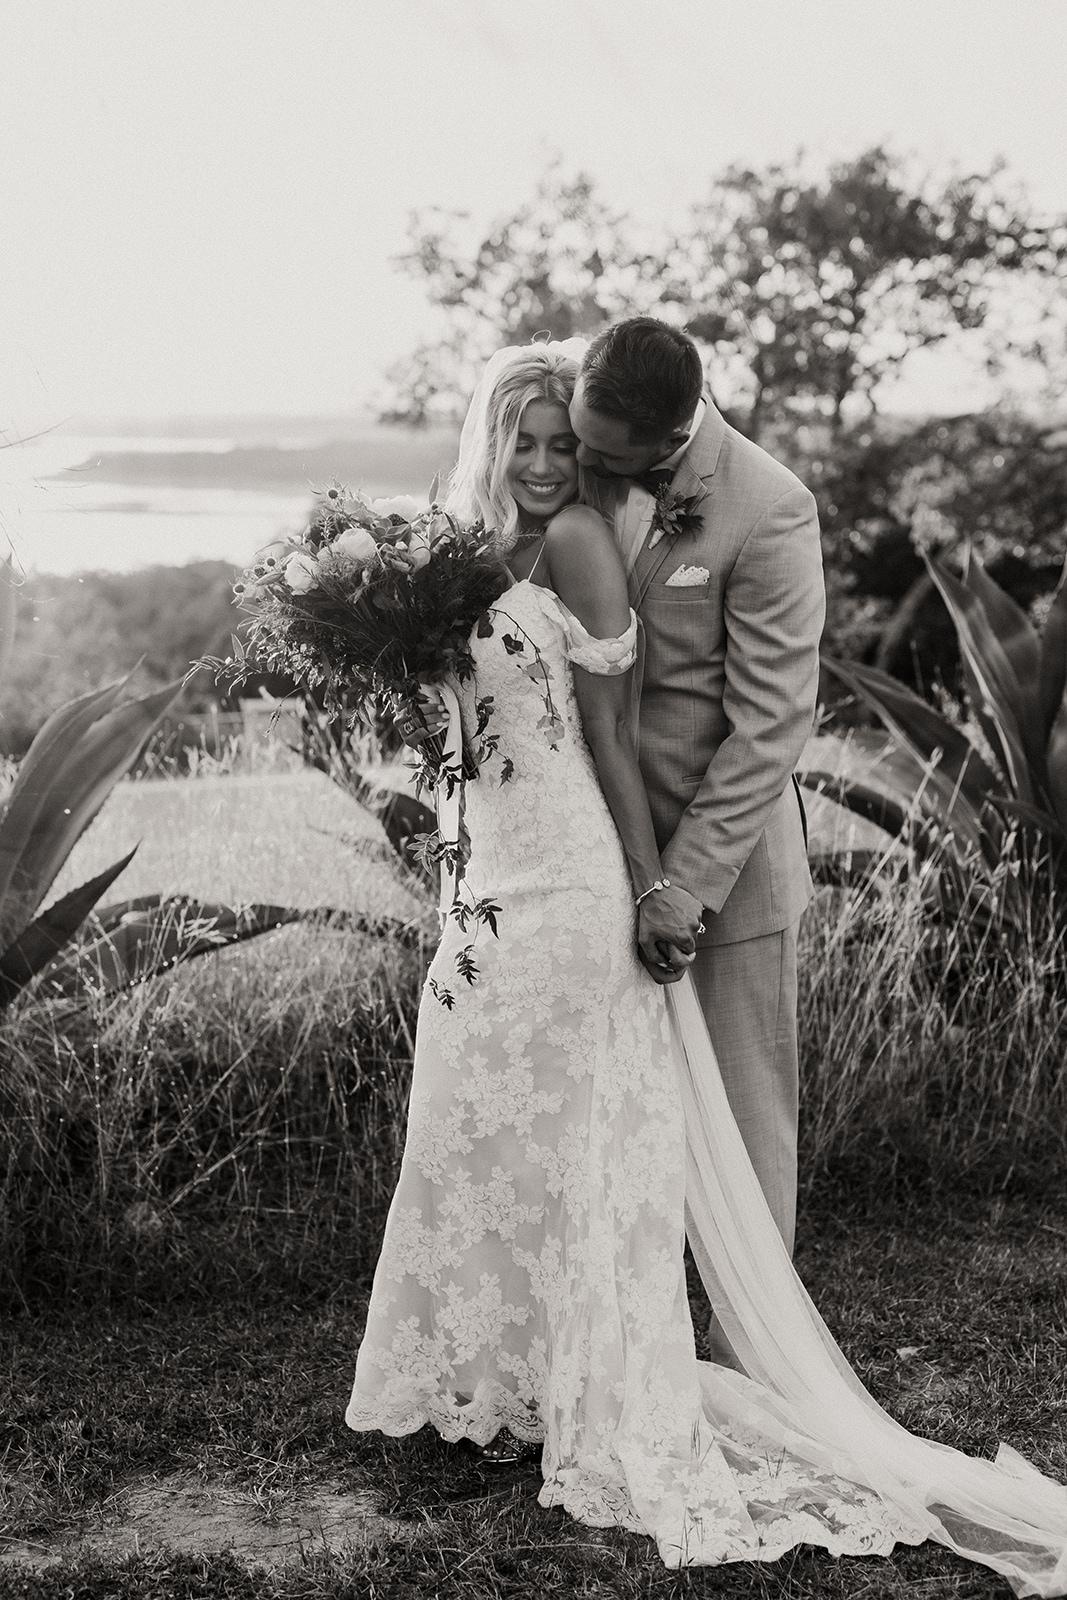 allie-tyler-vintage-villas-austin-texas-wedding-photographer-3020-2.jpg